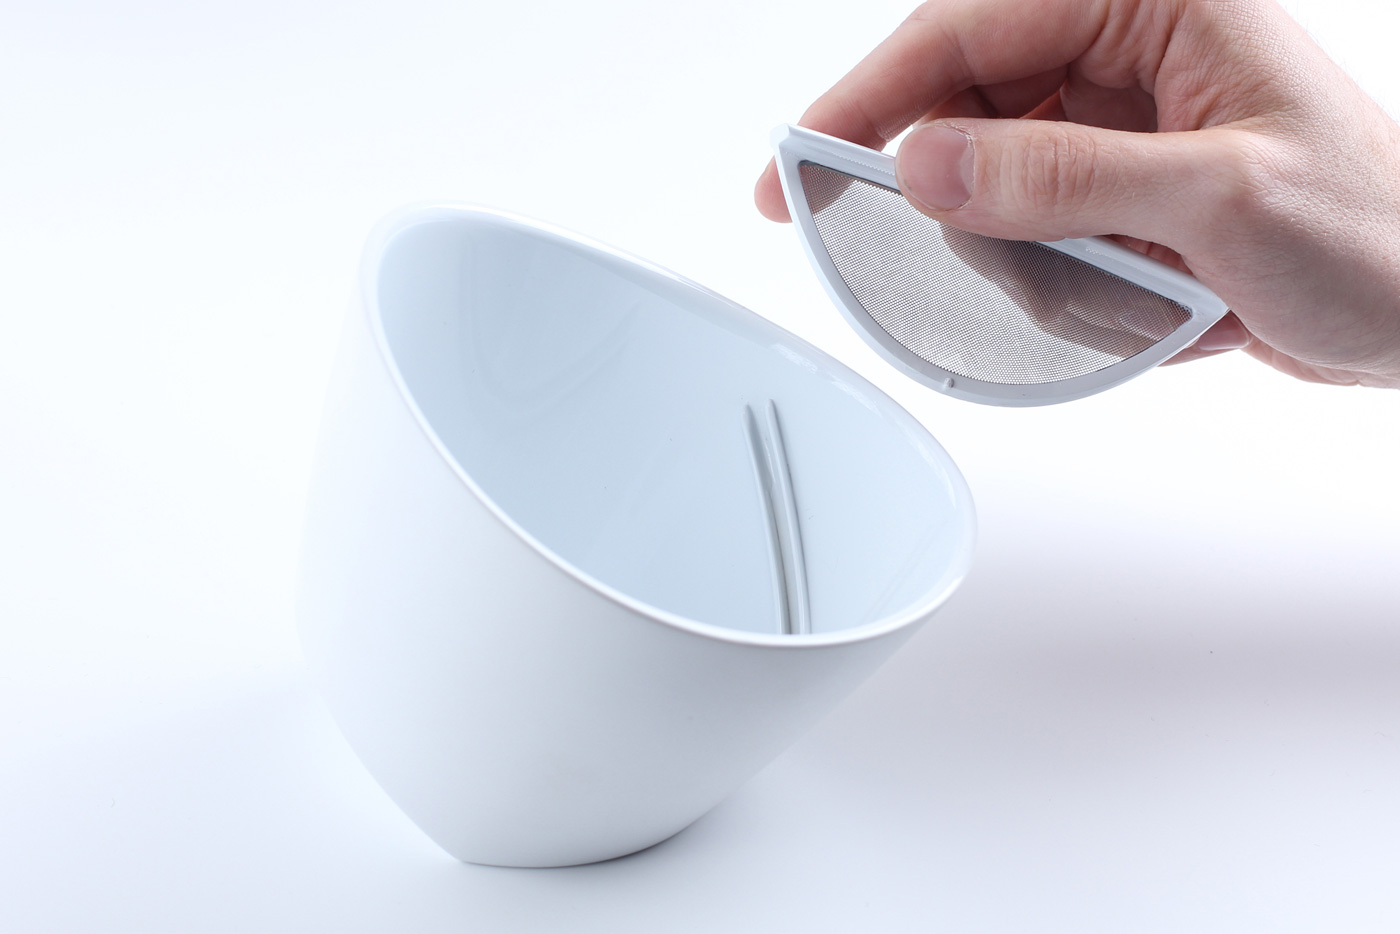 awesome-design-ideas-Teacup-Laura-Bougdanos-magisso-3